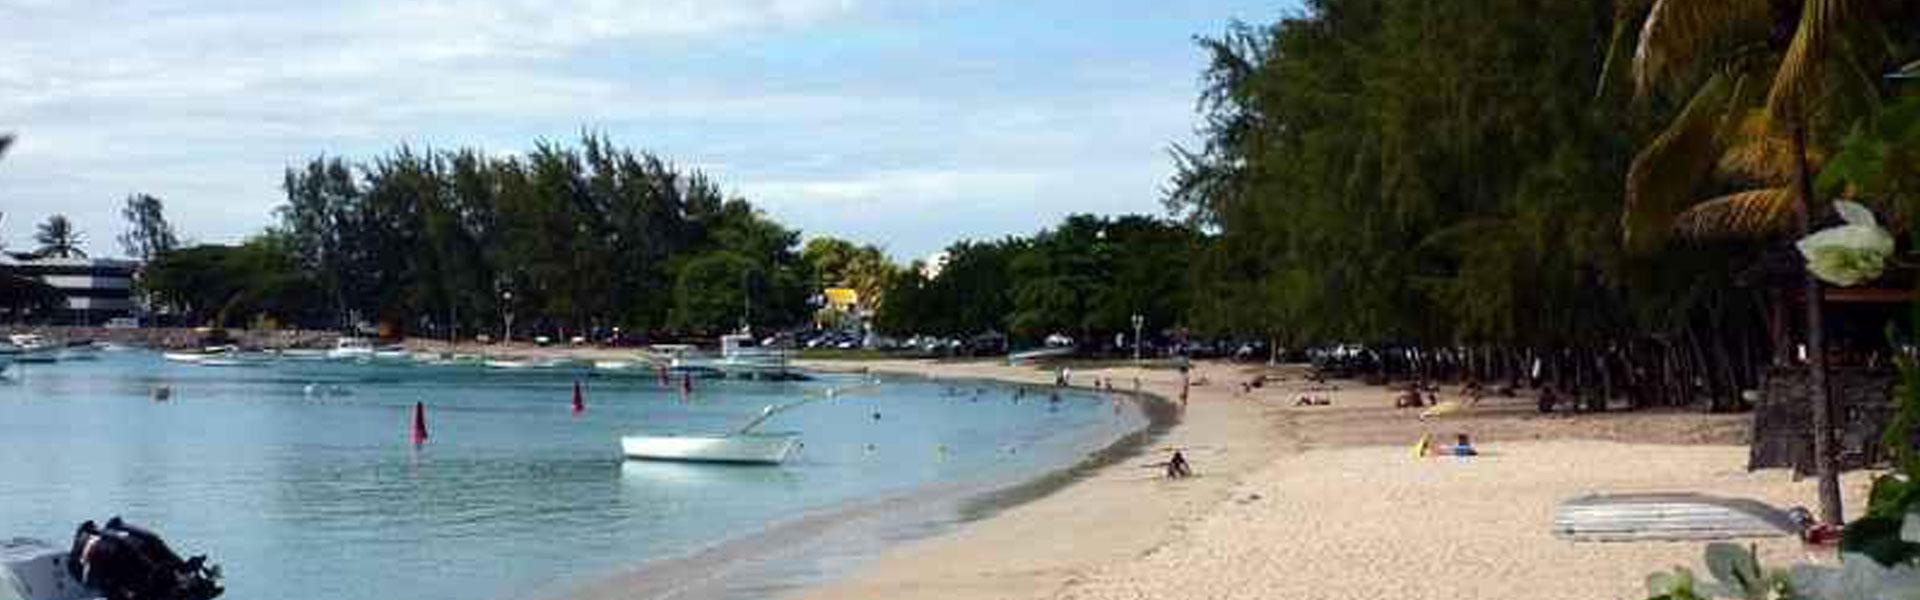 Plage Grand Baie Île Maurice